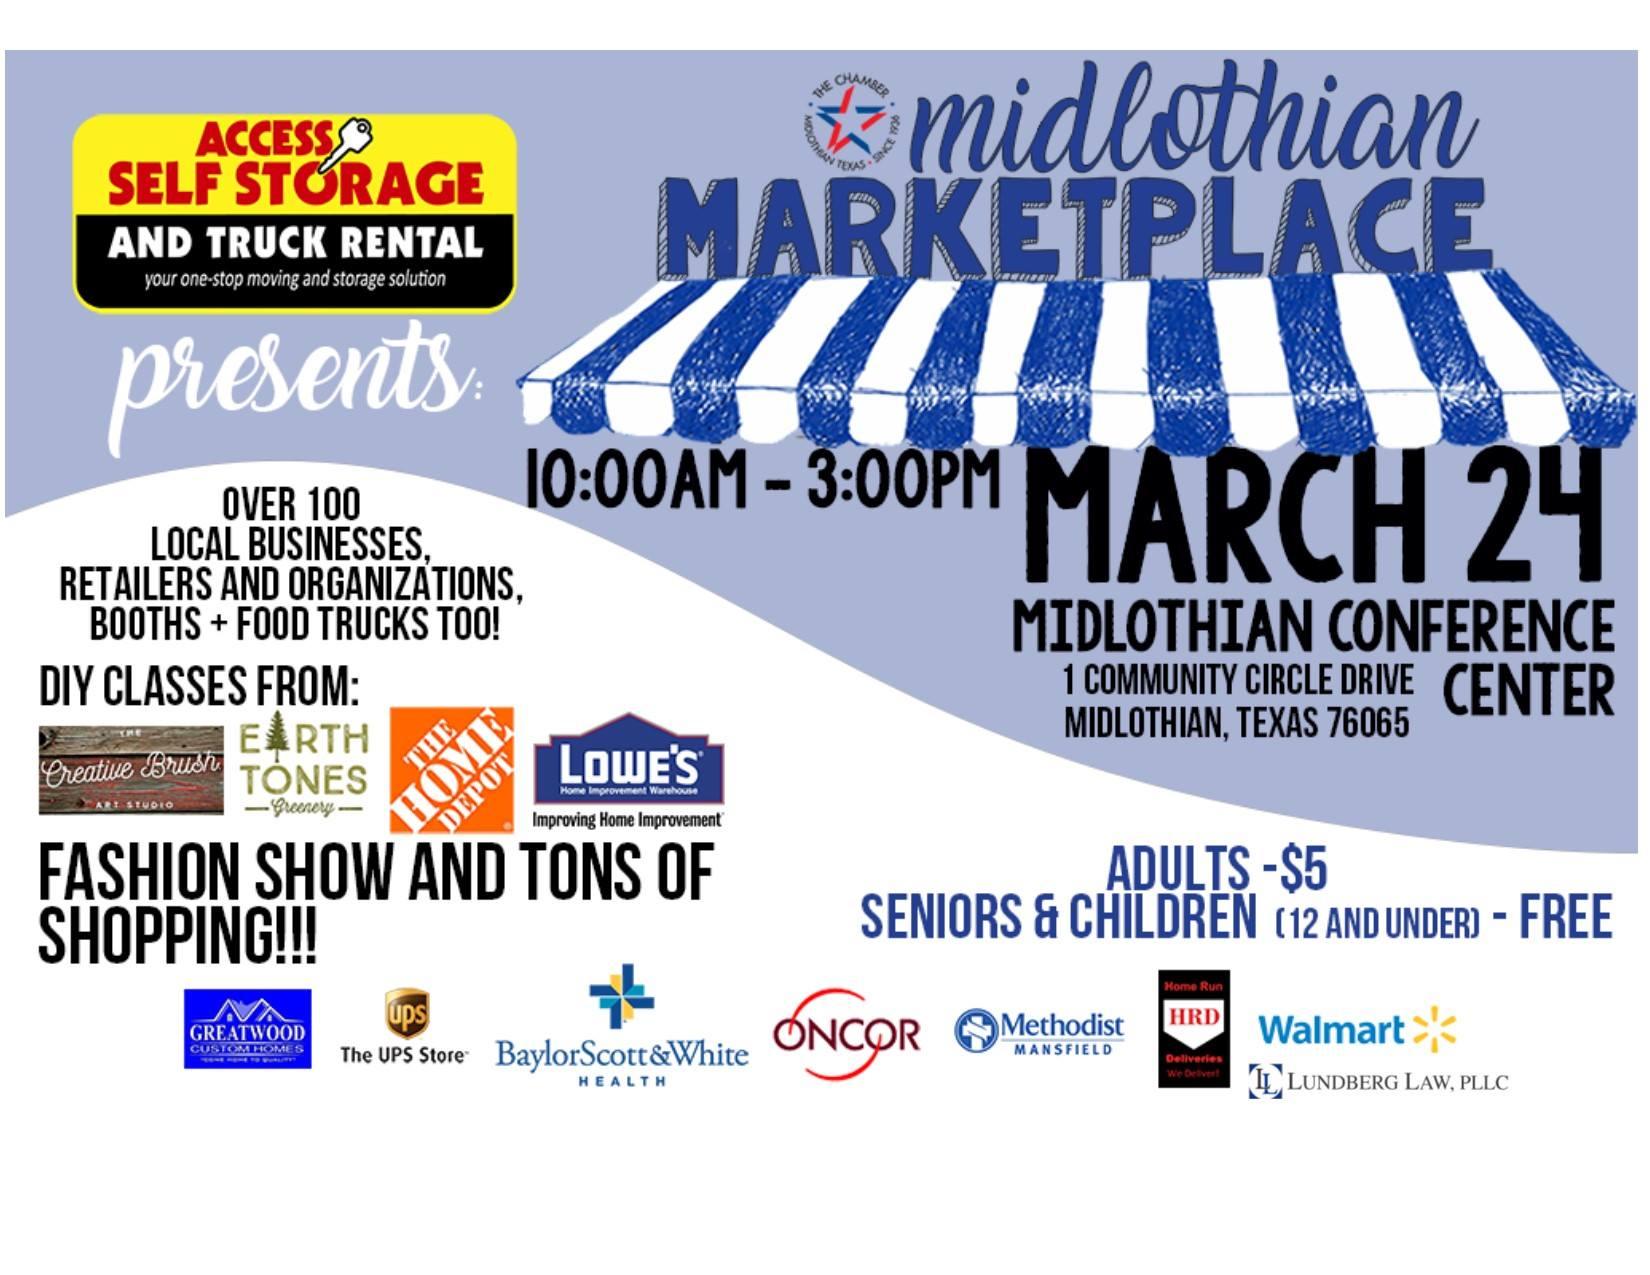 Midlothian, TX - Official Website